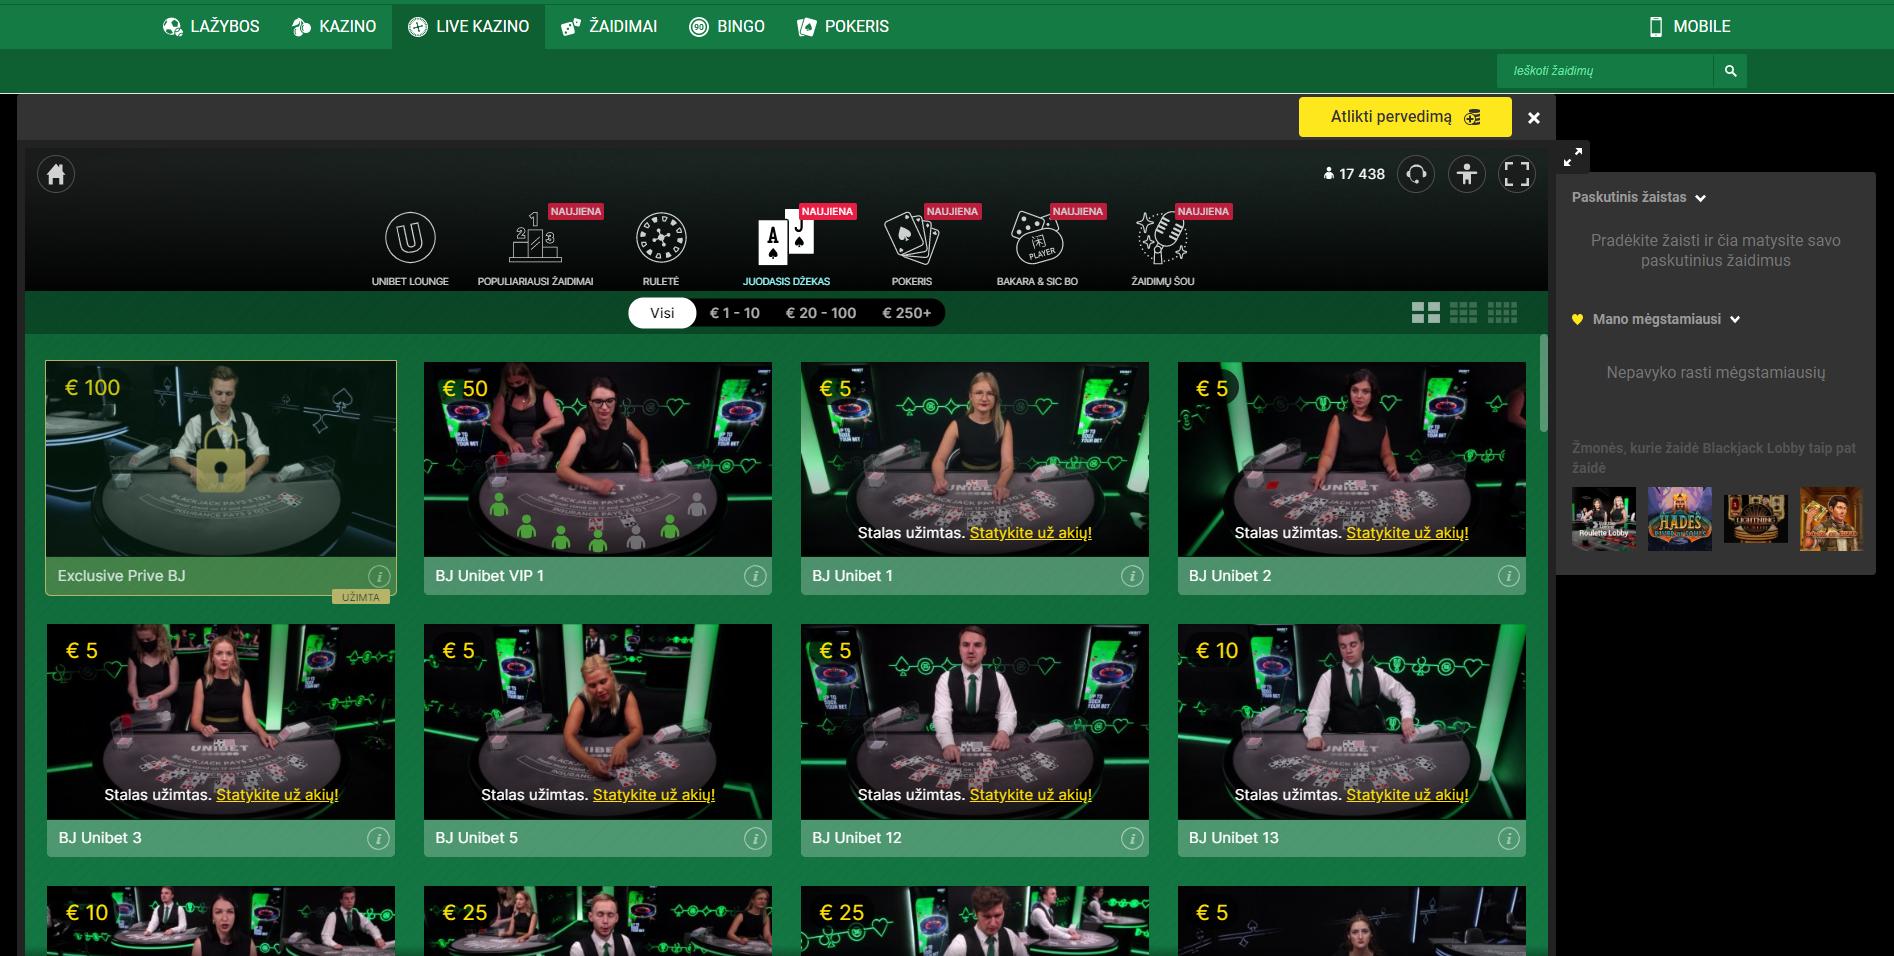 blackjack unibet evolution gaming live dealer - unibet live casino